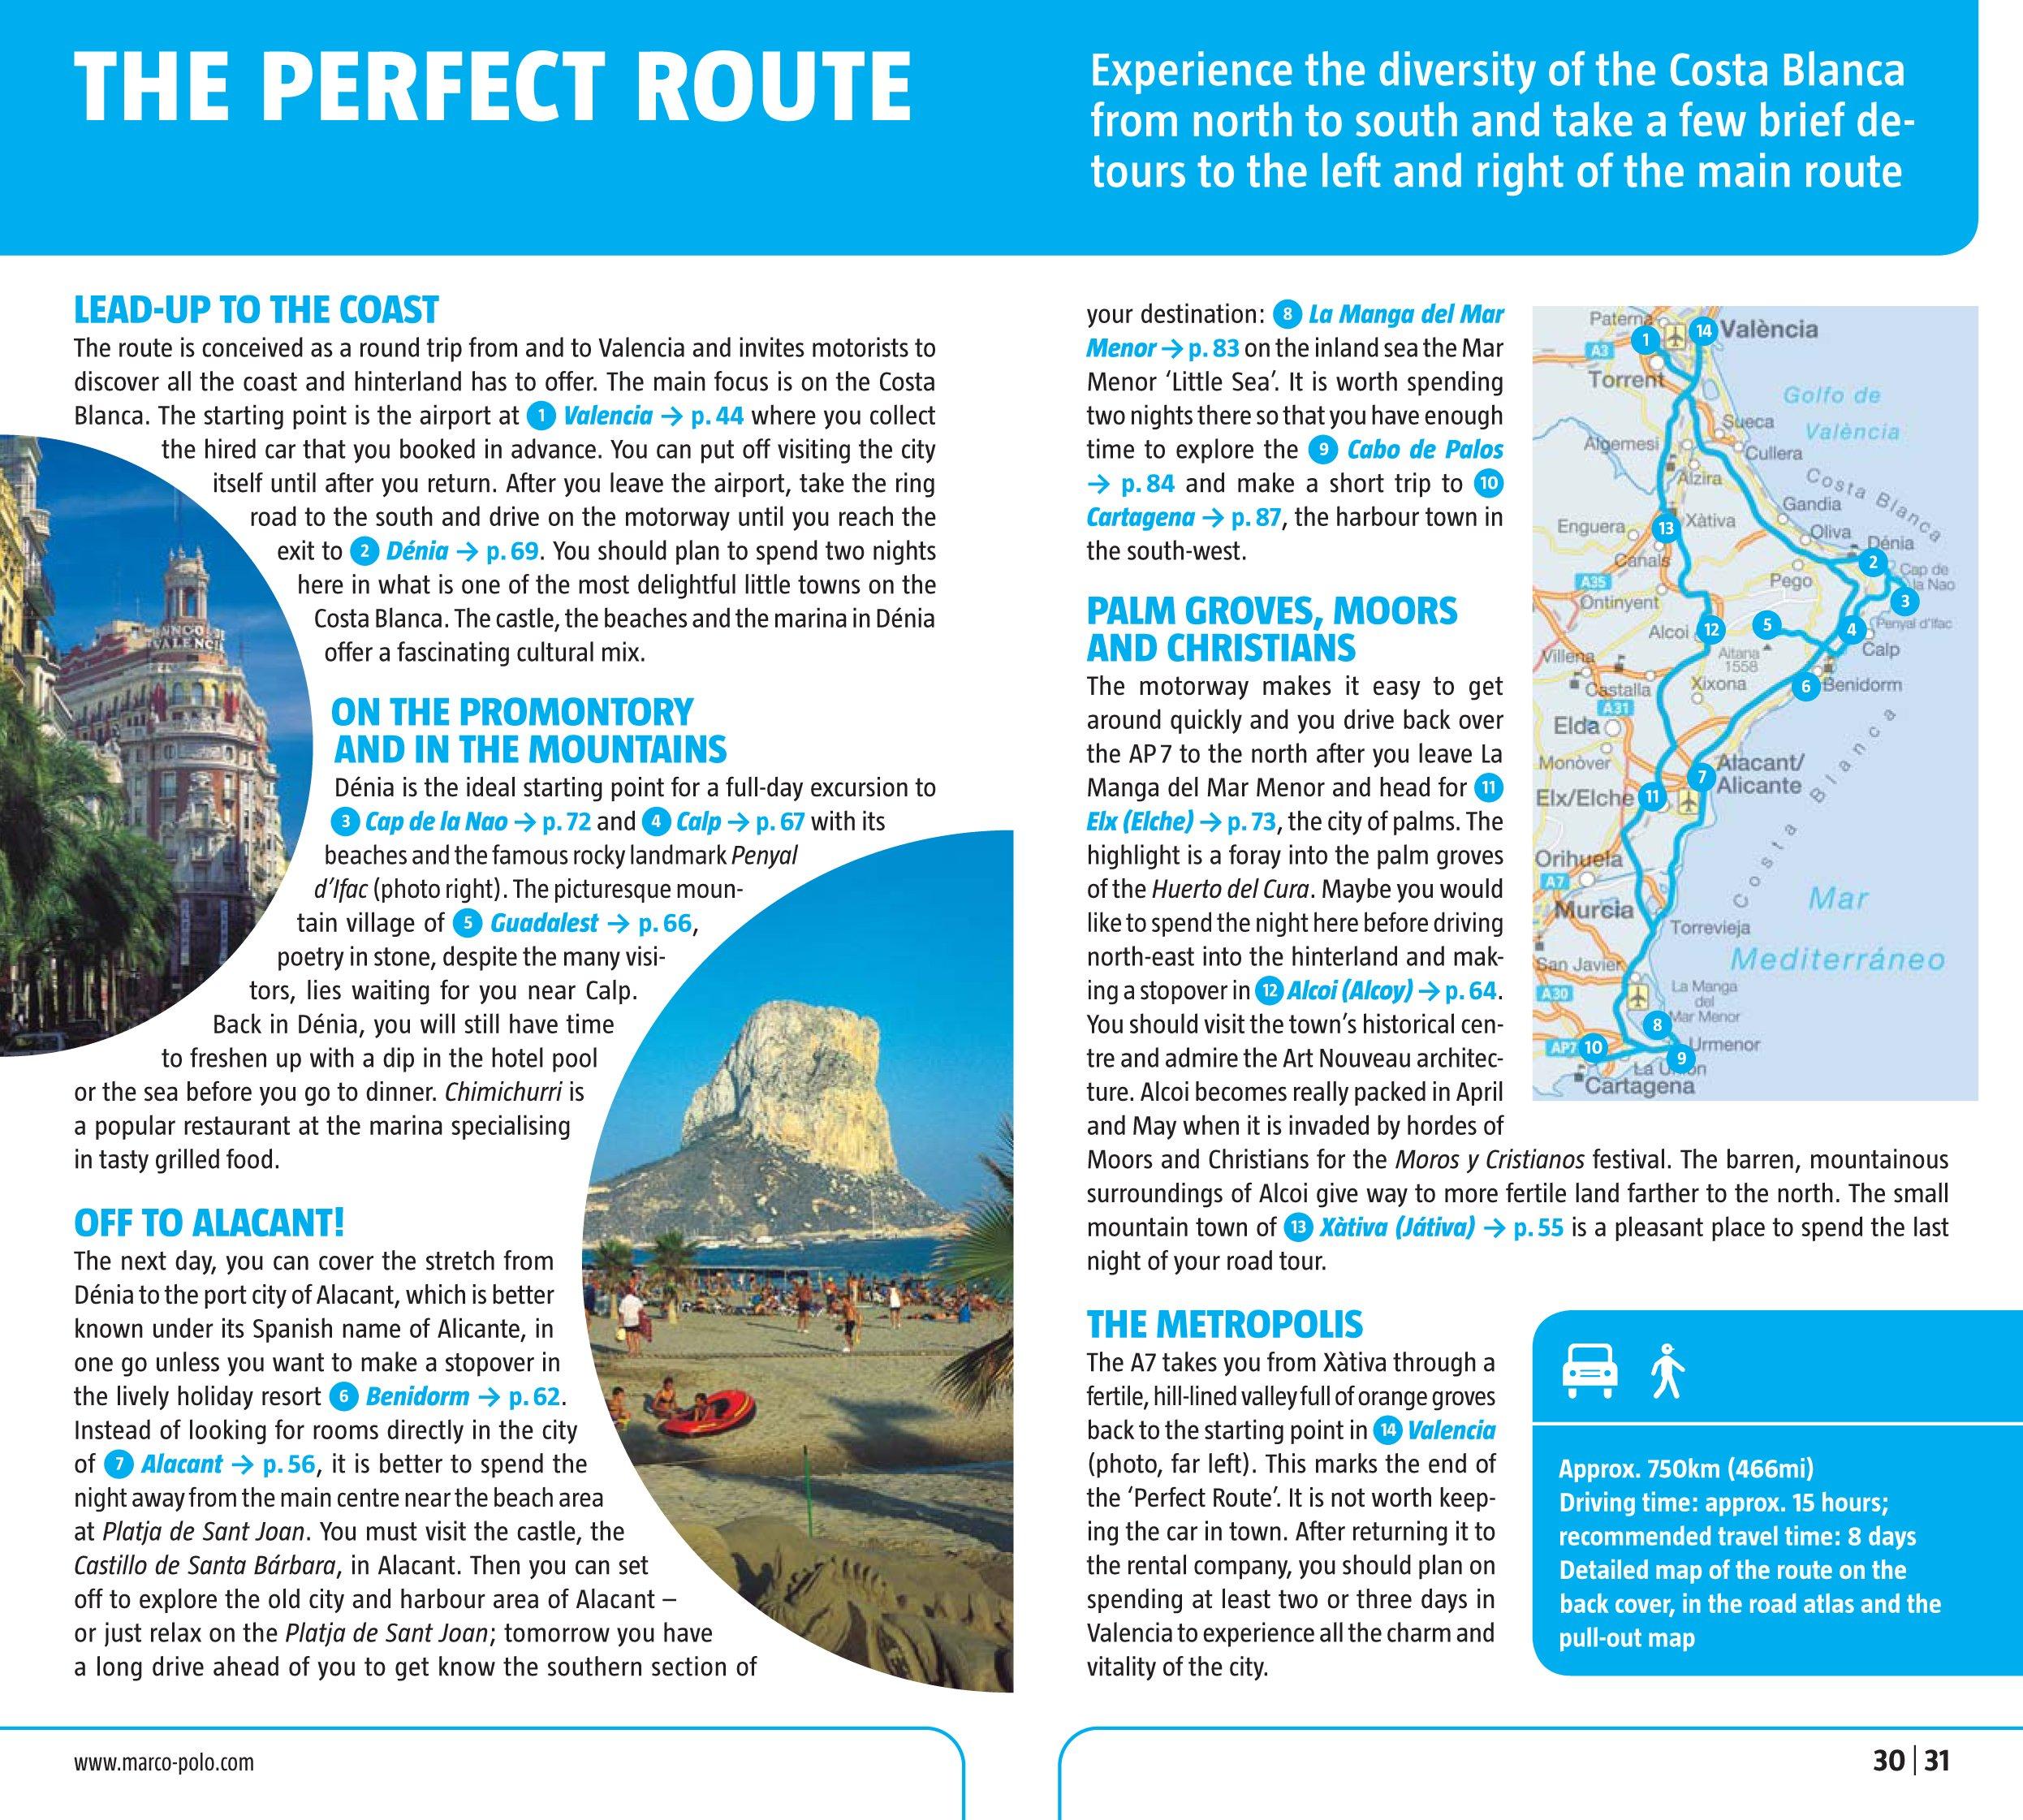 Costa Blanca Valencia Marco Polo Guide (Marco Polo Guides): Marco Polo Travel Publishing: 8601404437885: Amazon.com: Books